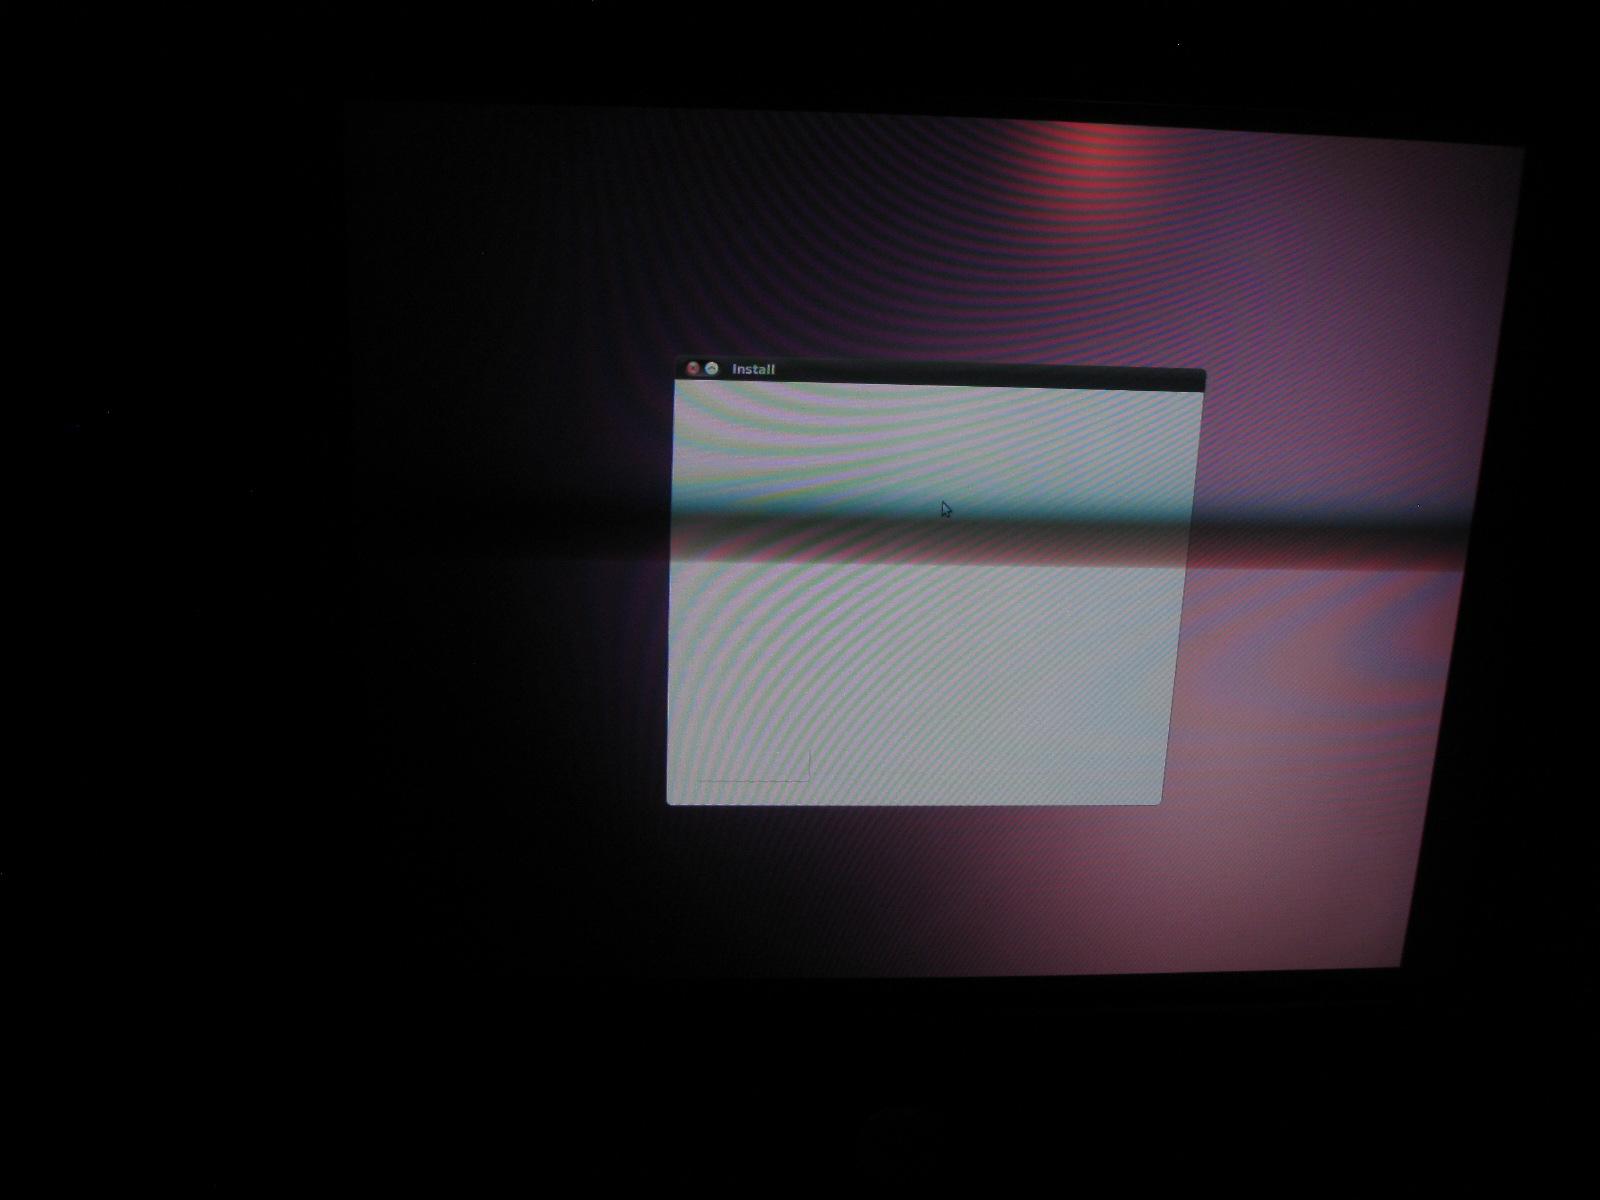 how to delete temp files in ubuntu